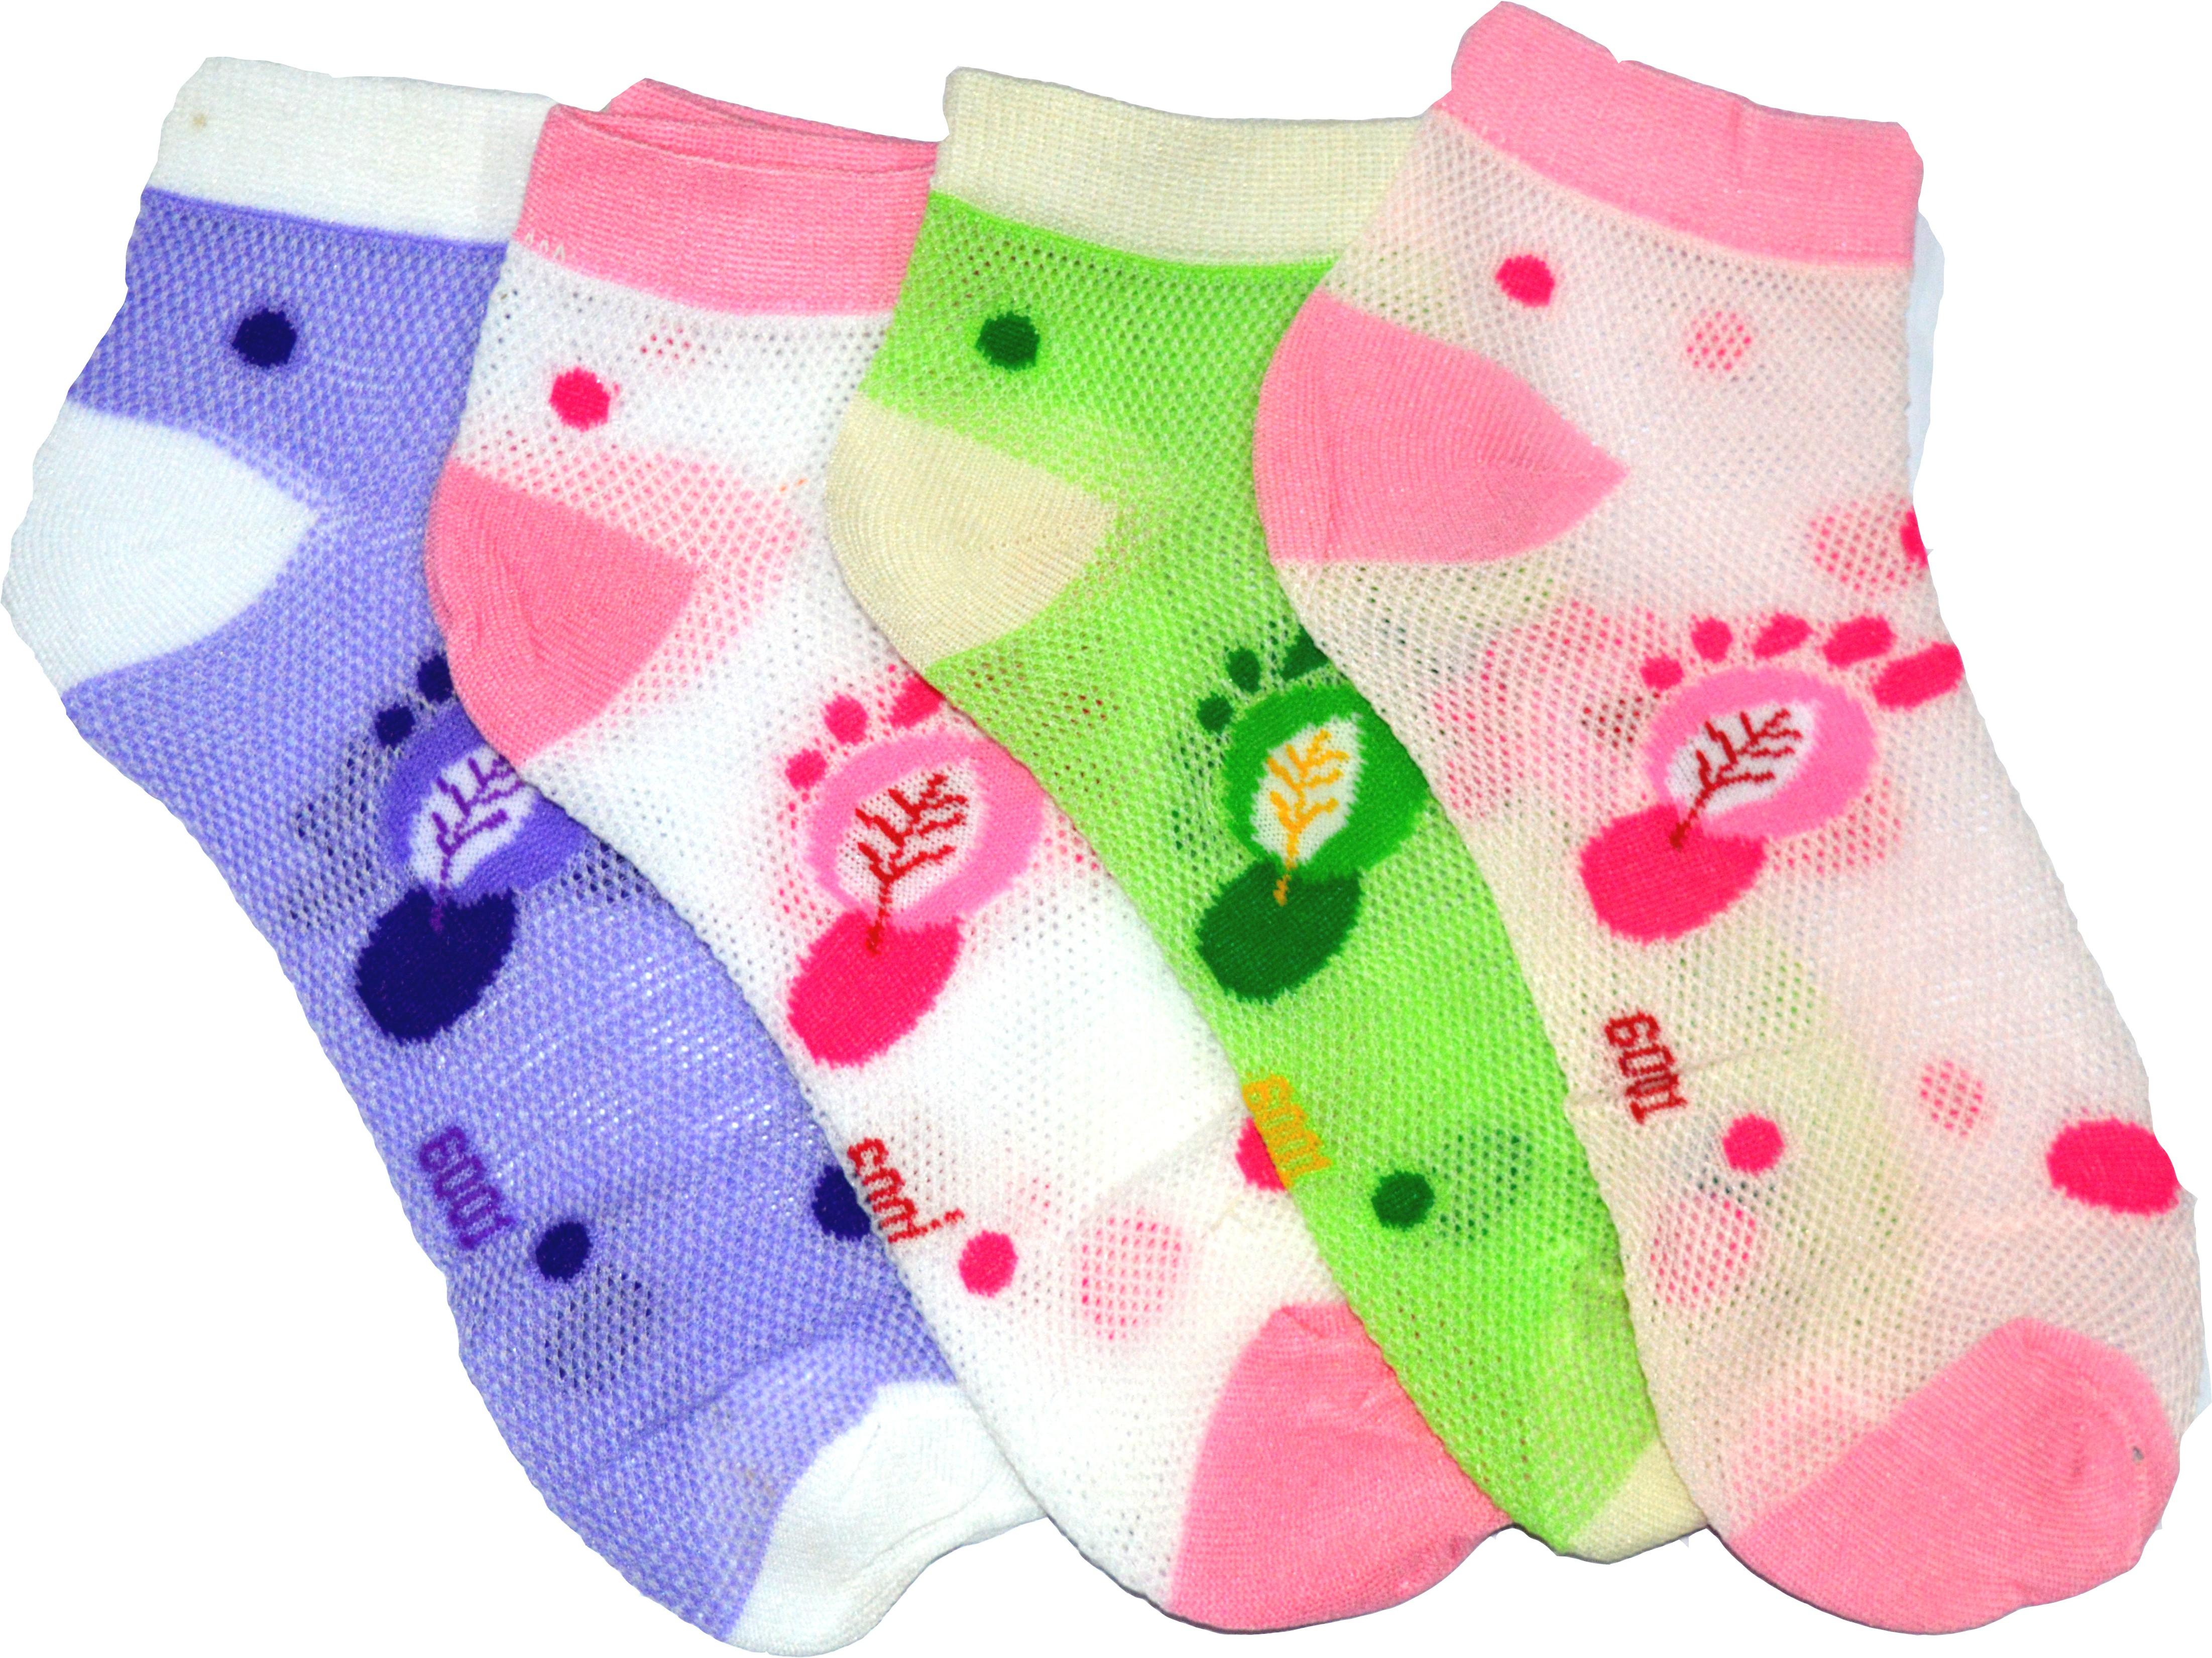 Gen Womens Printed Ankle Length Socks(Pack of 4)